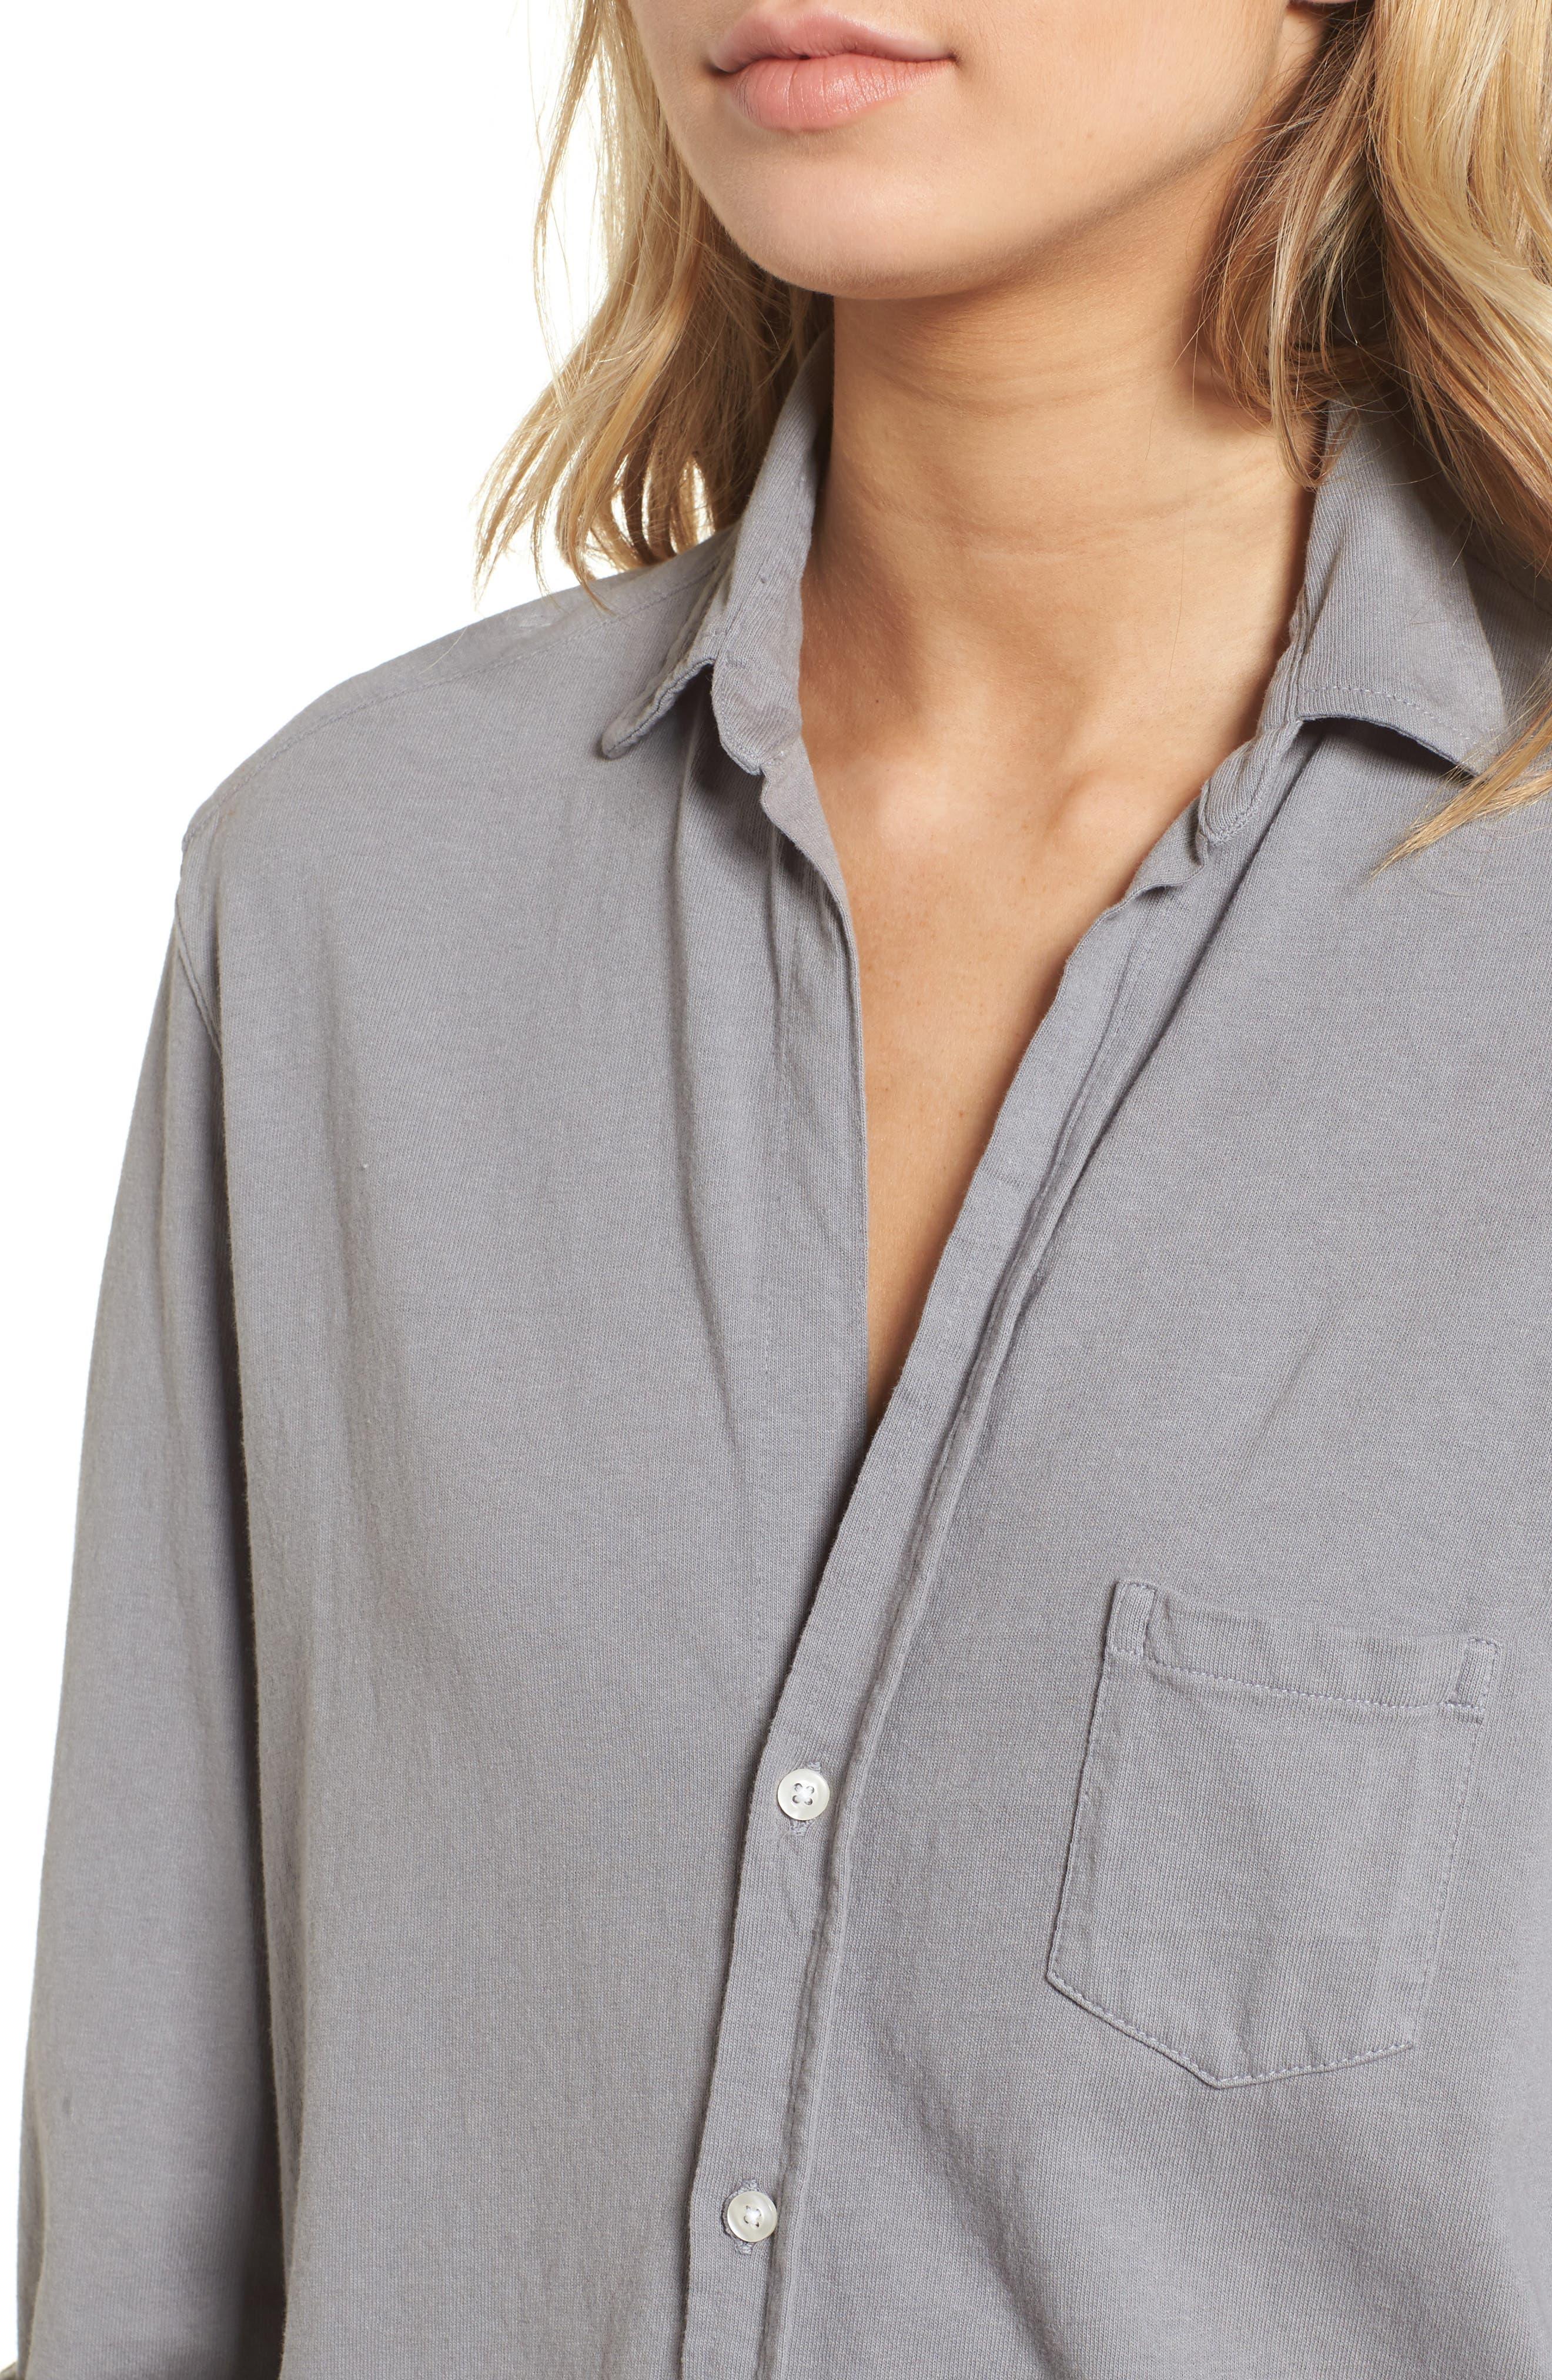 Tee Lab Knit Button Down Shirt,                             Alternate thumbnail 4, color,                             Shadow